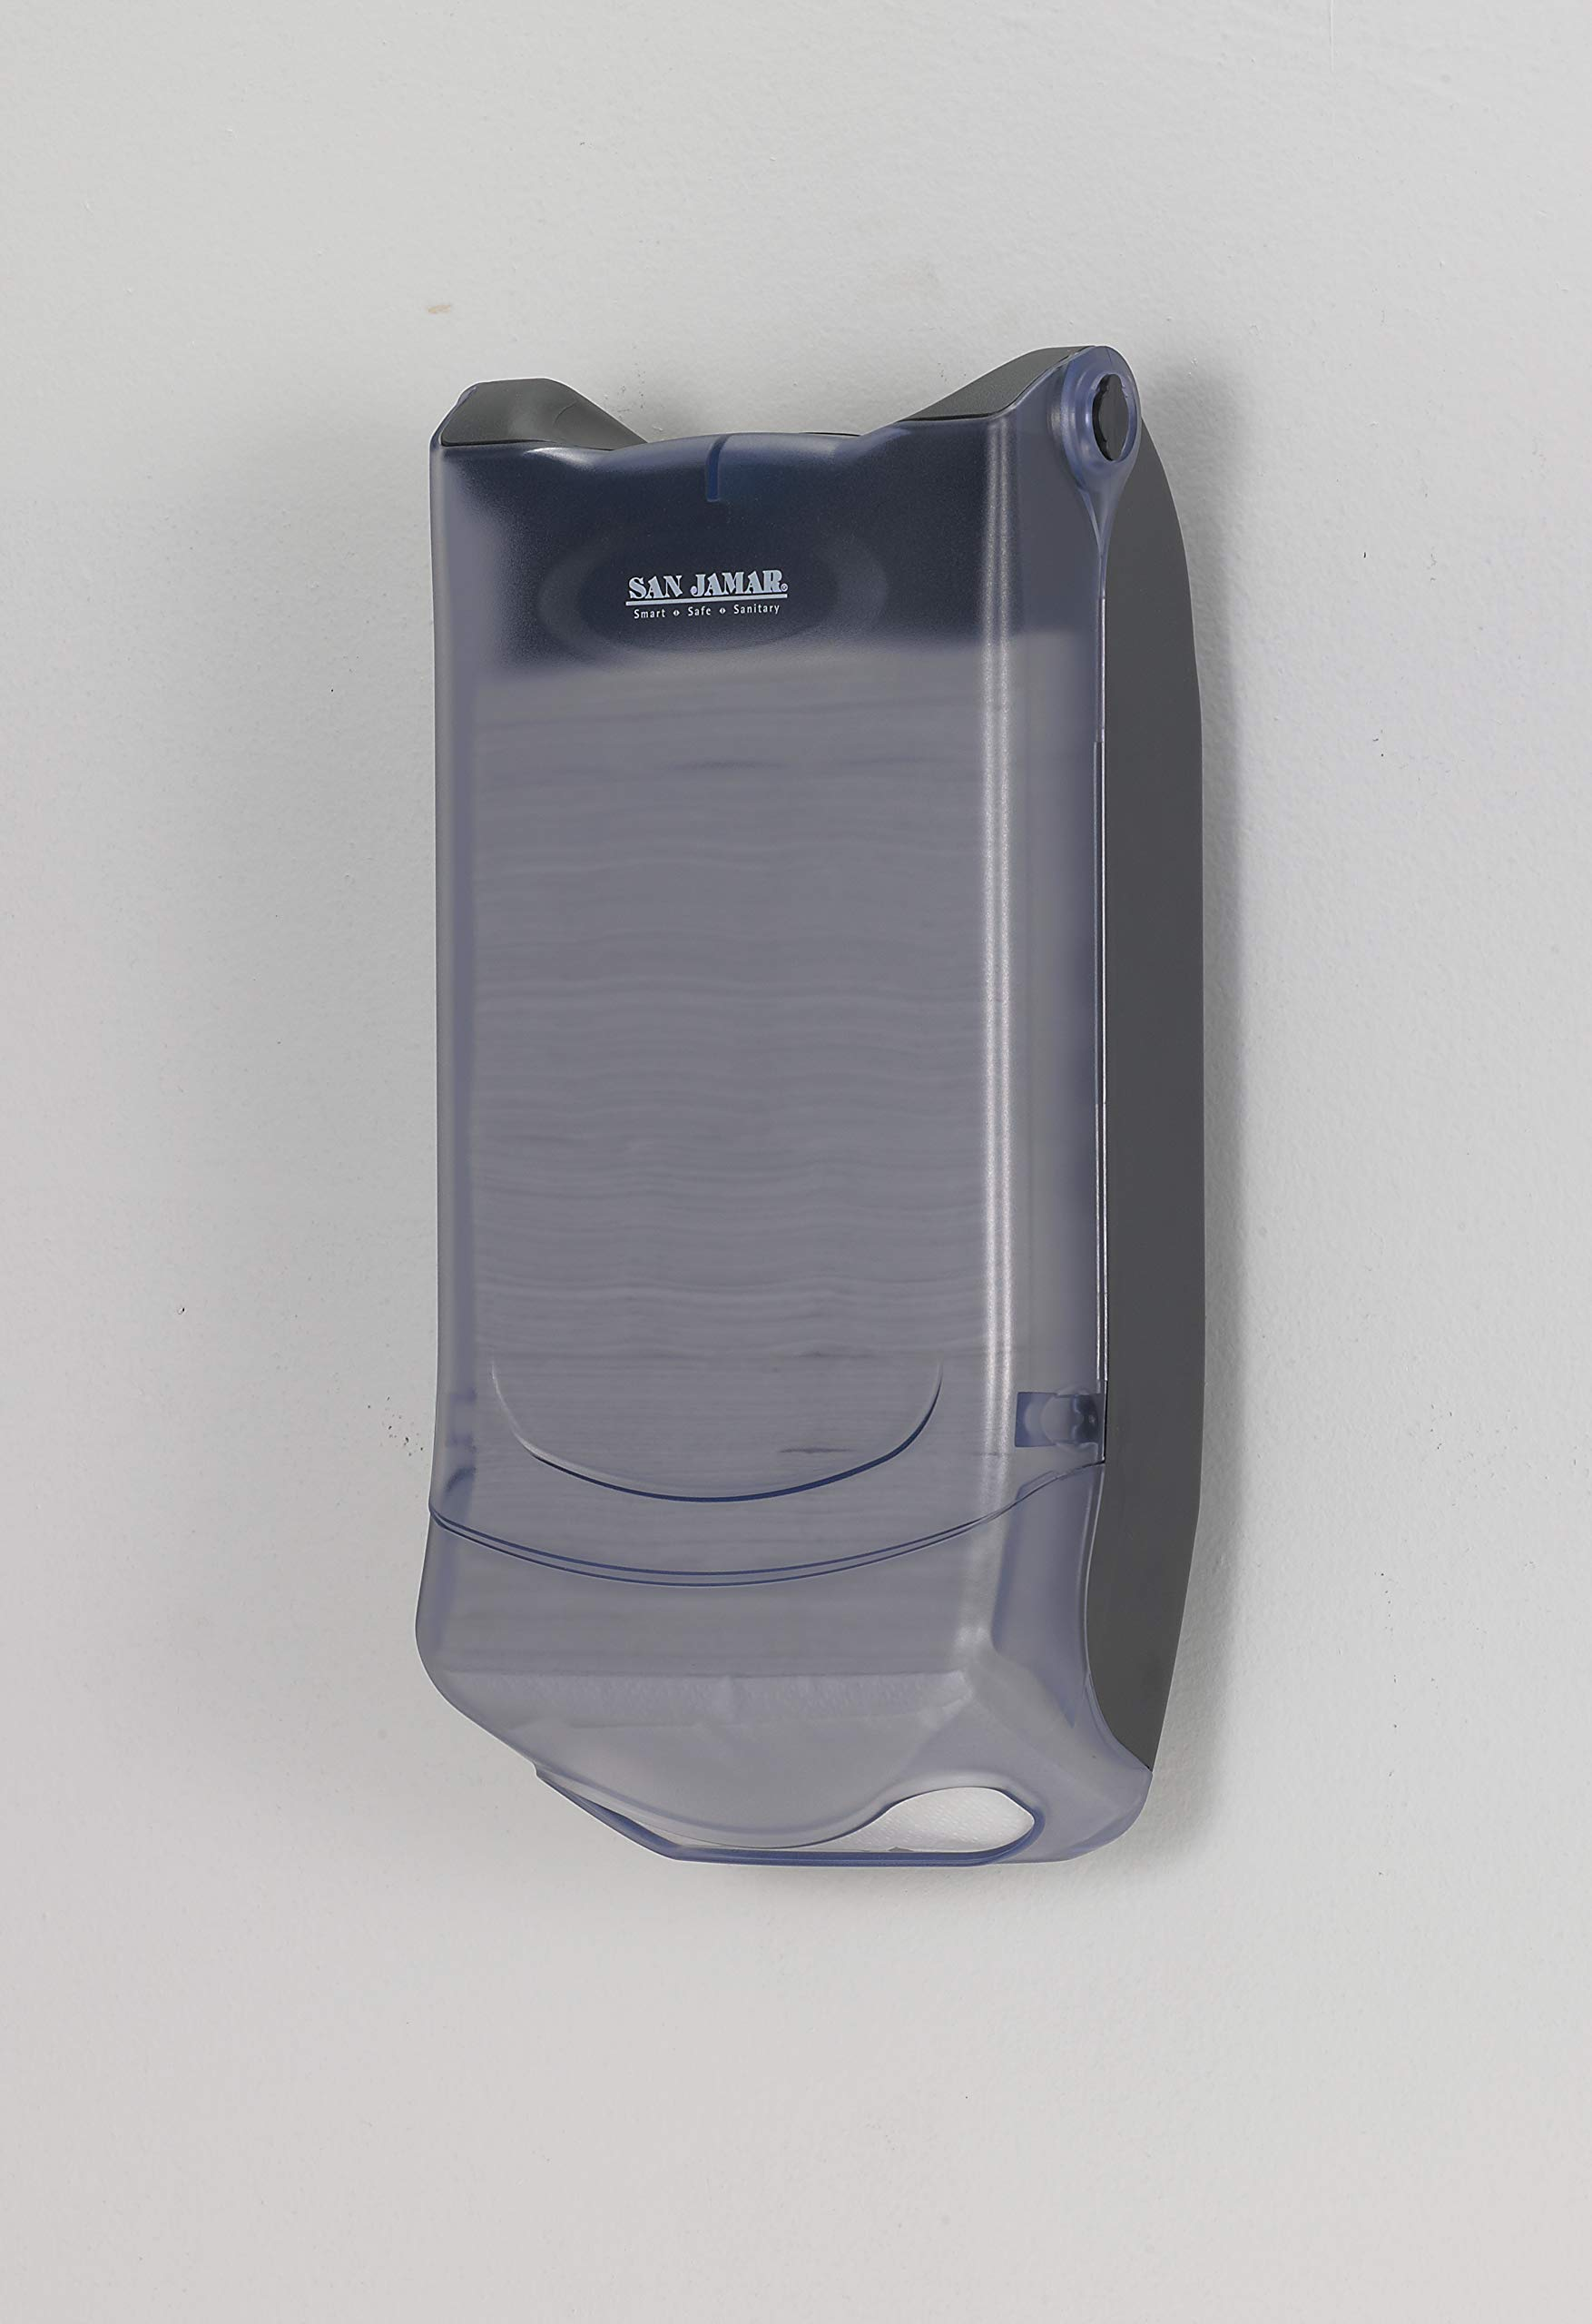 San Jamar H5004P Venue Wall Mount Mini Interfold Napkin Dispenser, 600 Capacity, 8'' Width x 15-3/4'' Height x 5-9/10'' Depth, Clear by San Jamar (Image #4)